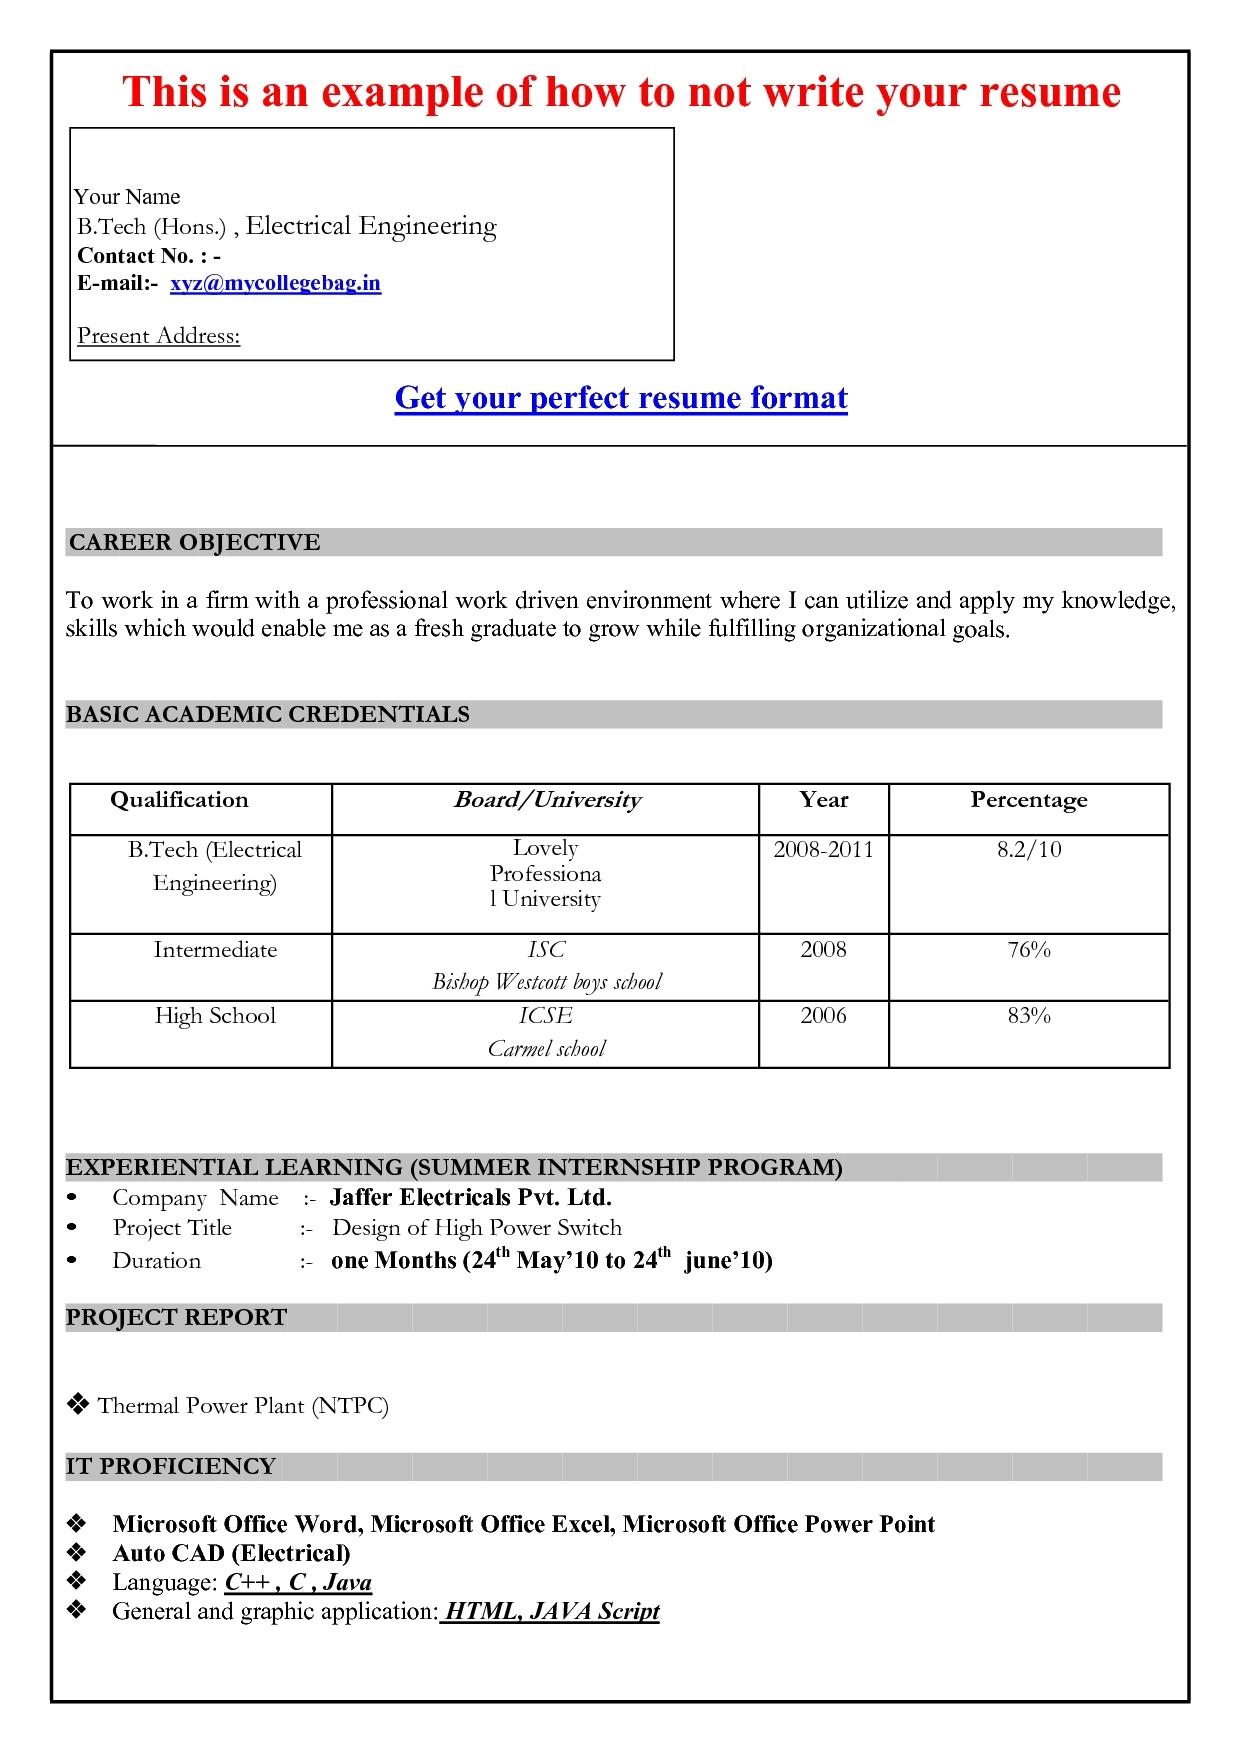 invoice template microsoft word 2007 invoice template free 2016 microsoft word 2007 invoice template